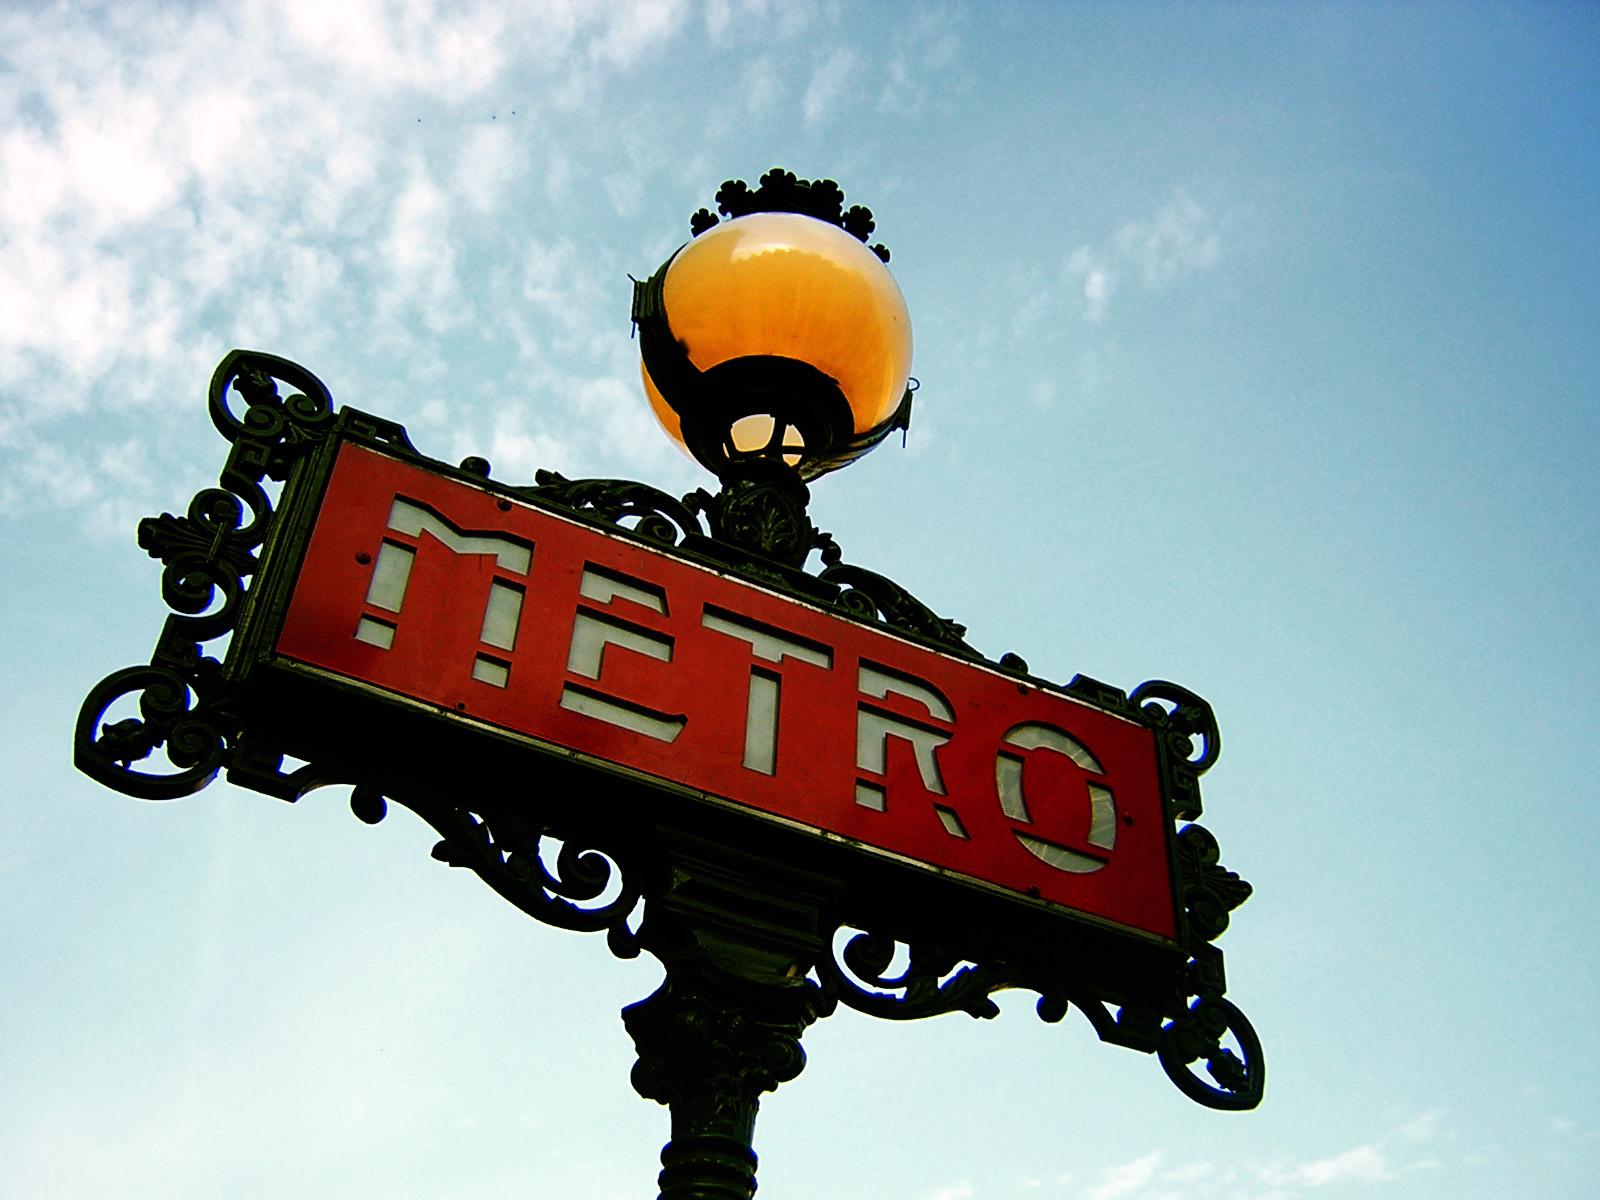 File:Paris Metro Sign.jpg - Wikimedia Commons